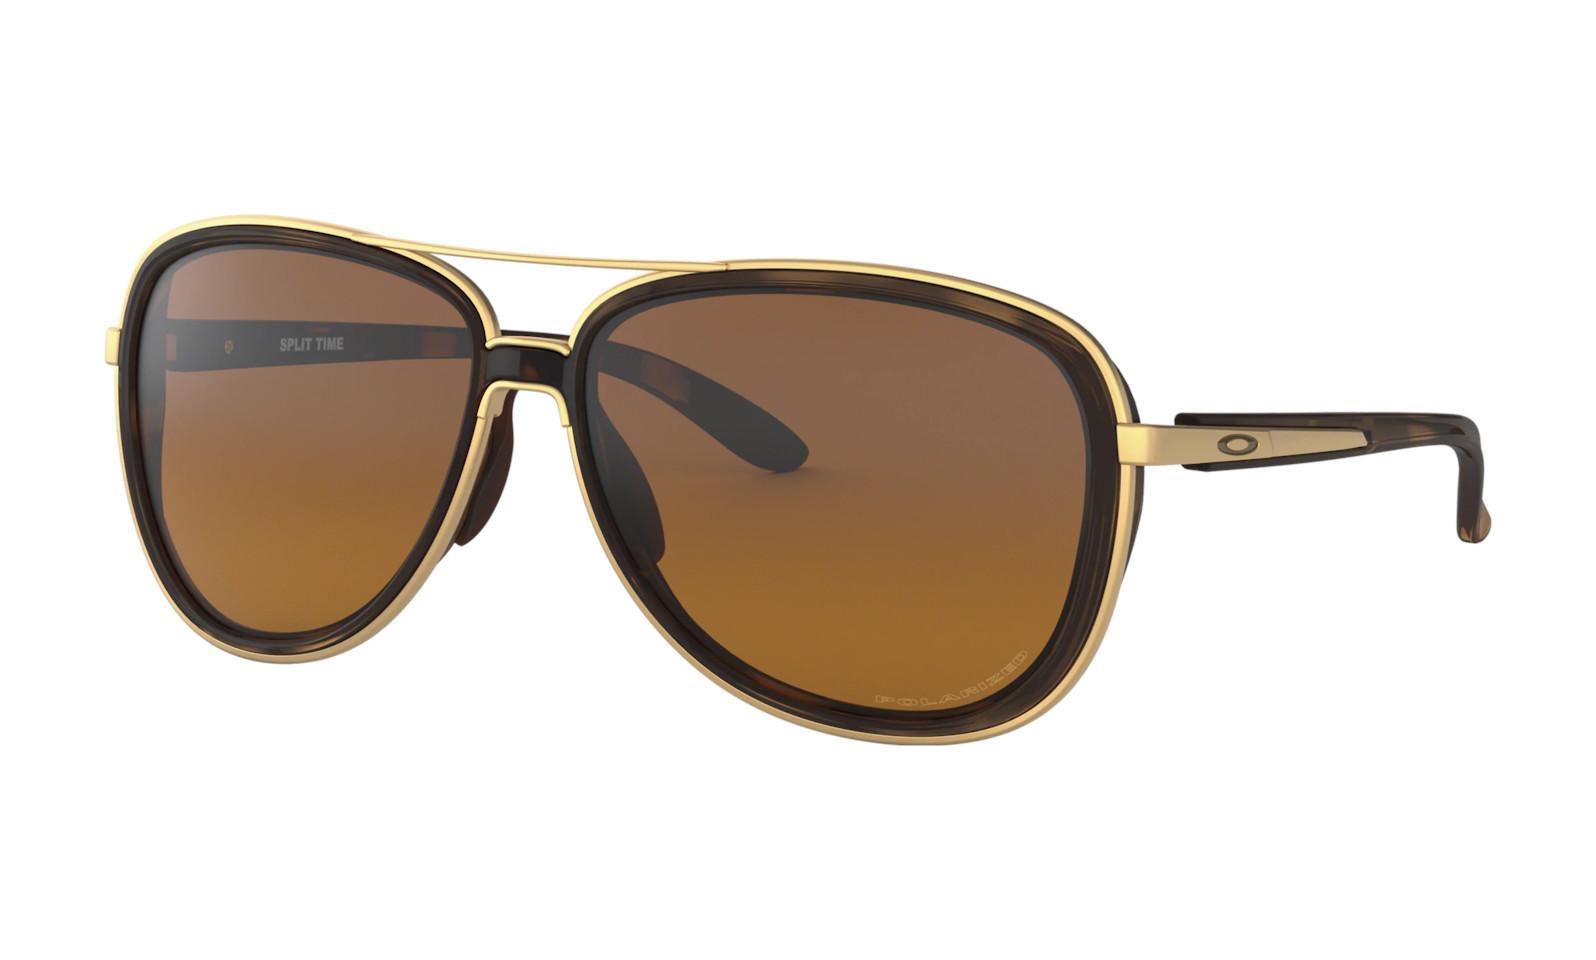 Oakley Split Time Women's - Brown Tortoise frames with Brown Gradient Polarized lenses